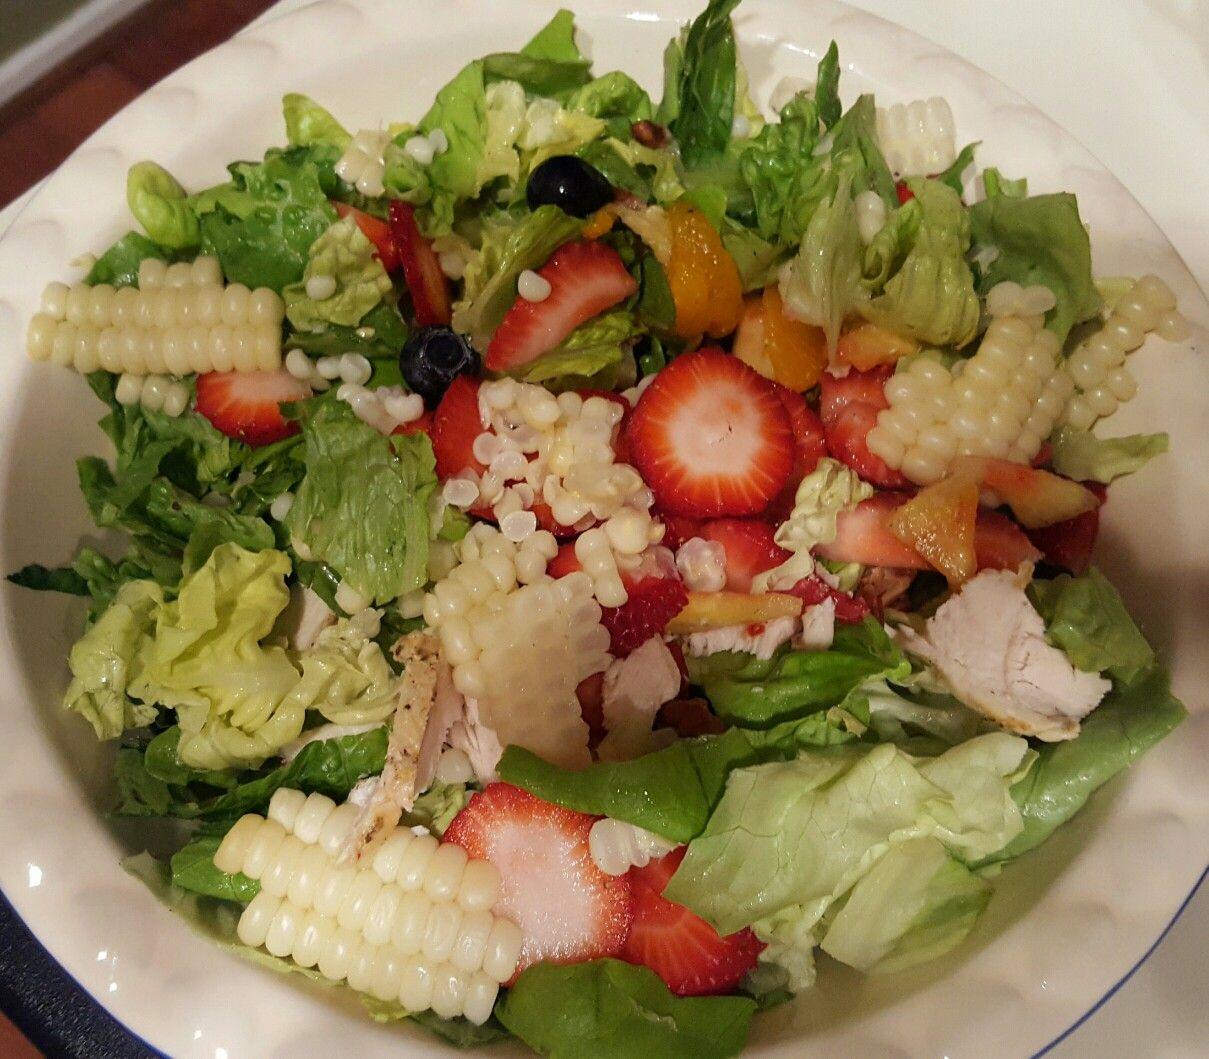 Corn salad with vinaigrette